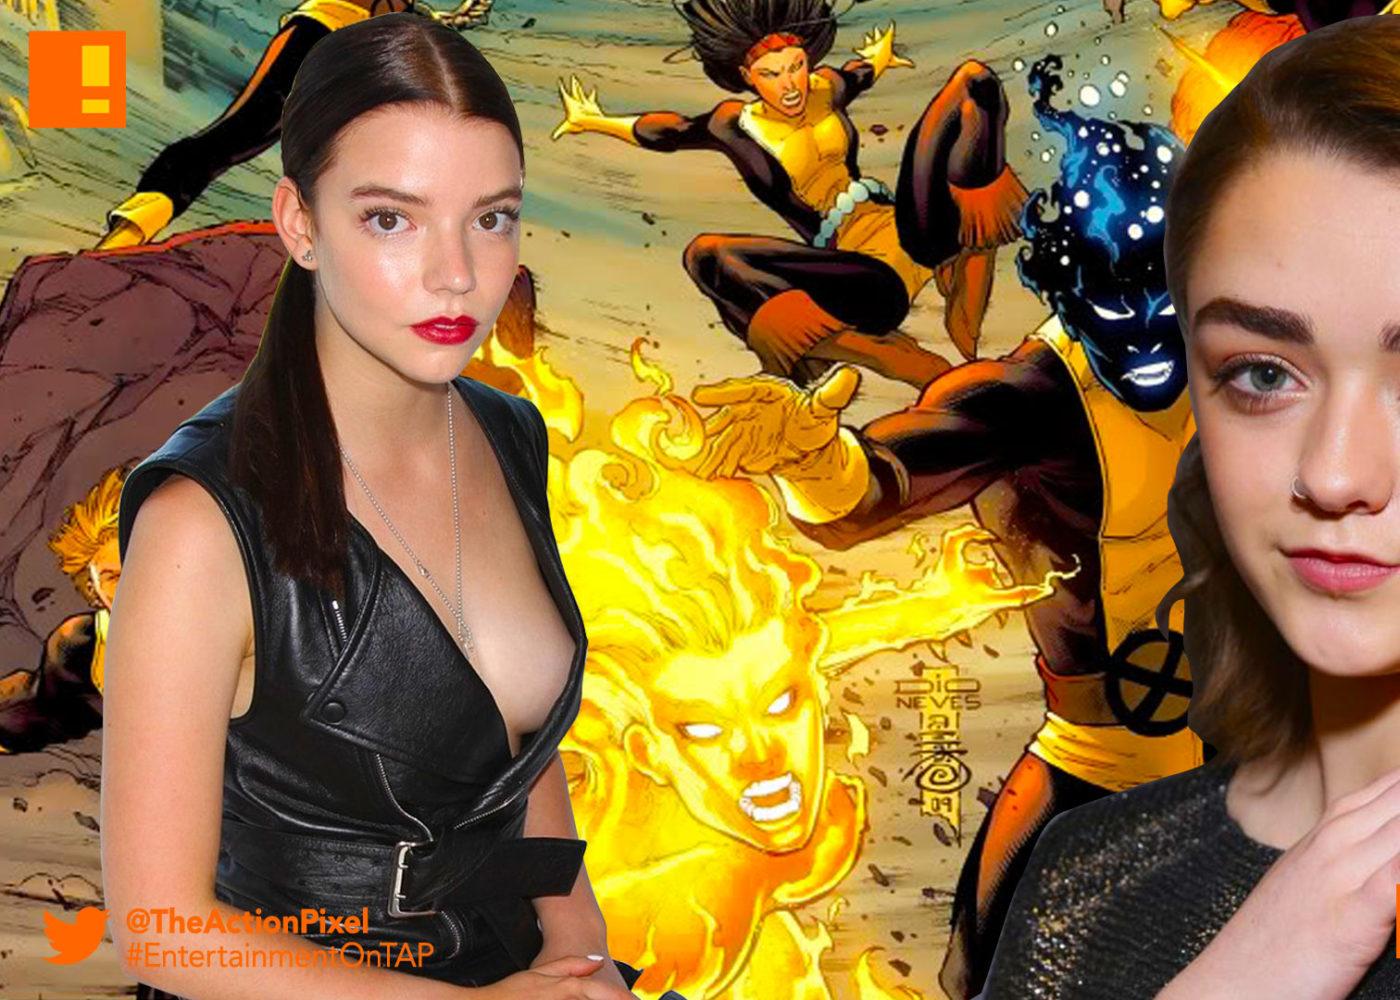 magik, x-men, xmen, new mutants, x-men: new mutants, fox, marvel, entertainment on tap, Anya Taylor-Joy, maisie williams,wolfsbane, marvel comics, entertainment on tap, the action pixel